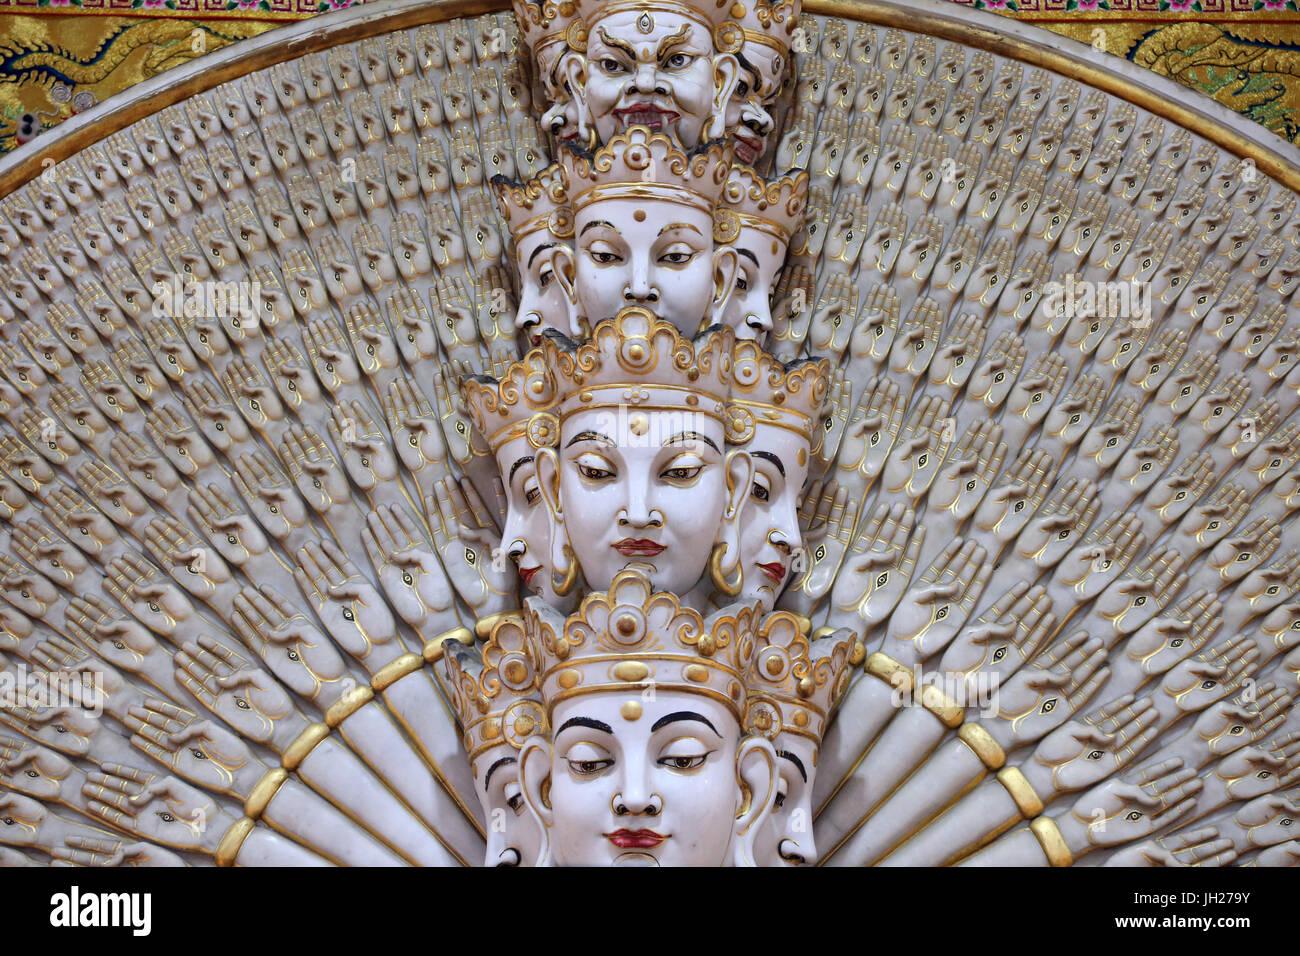 Kong Meng San Phor Kark See Monastery. Hall of great compassion.  Avalokiteshvara Bodhisvattva of a Thousand Arms and Eyes statue.  Singapore. Stock Photo